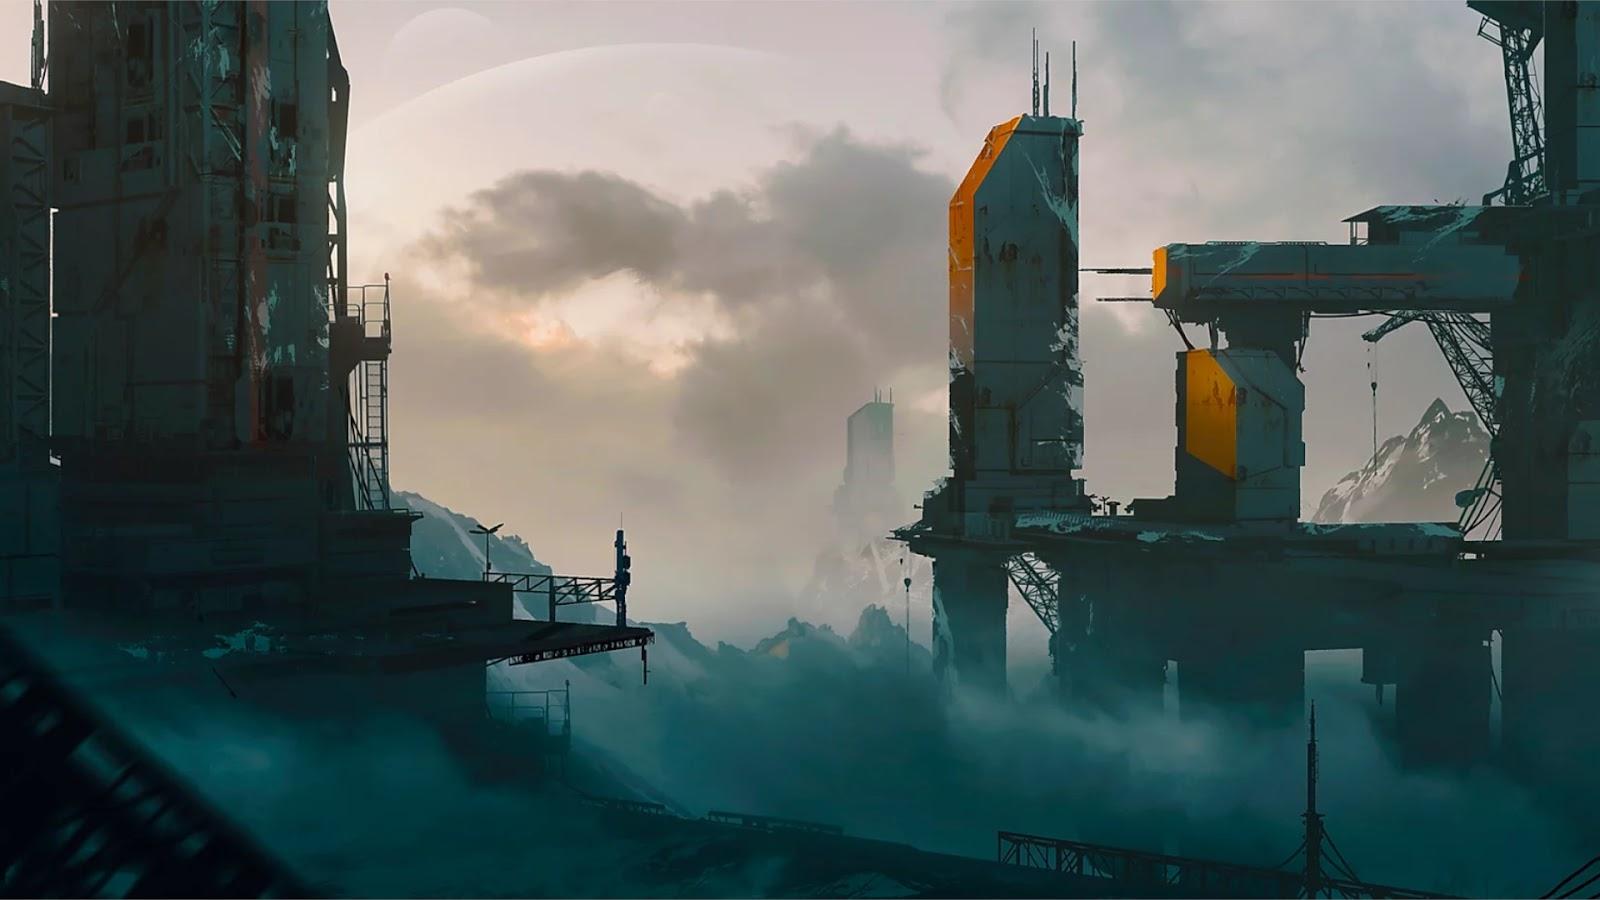 Board Games News Collider Wizards of the Coats Opens Archetype Entertainment Studio Sci-Fi RPG James Ohlen Bioware Developer